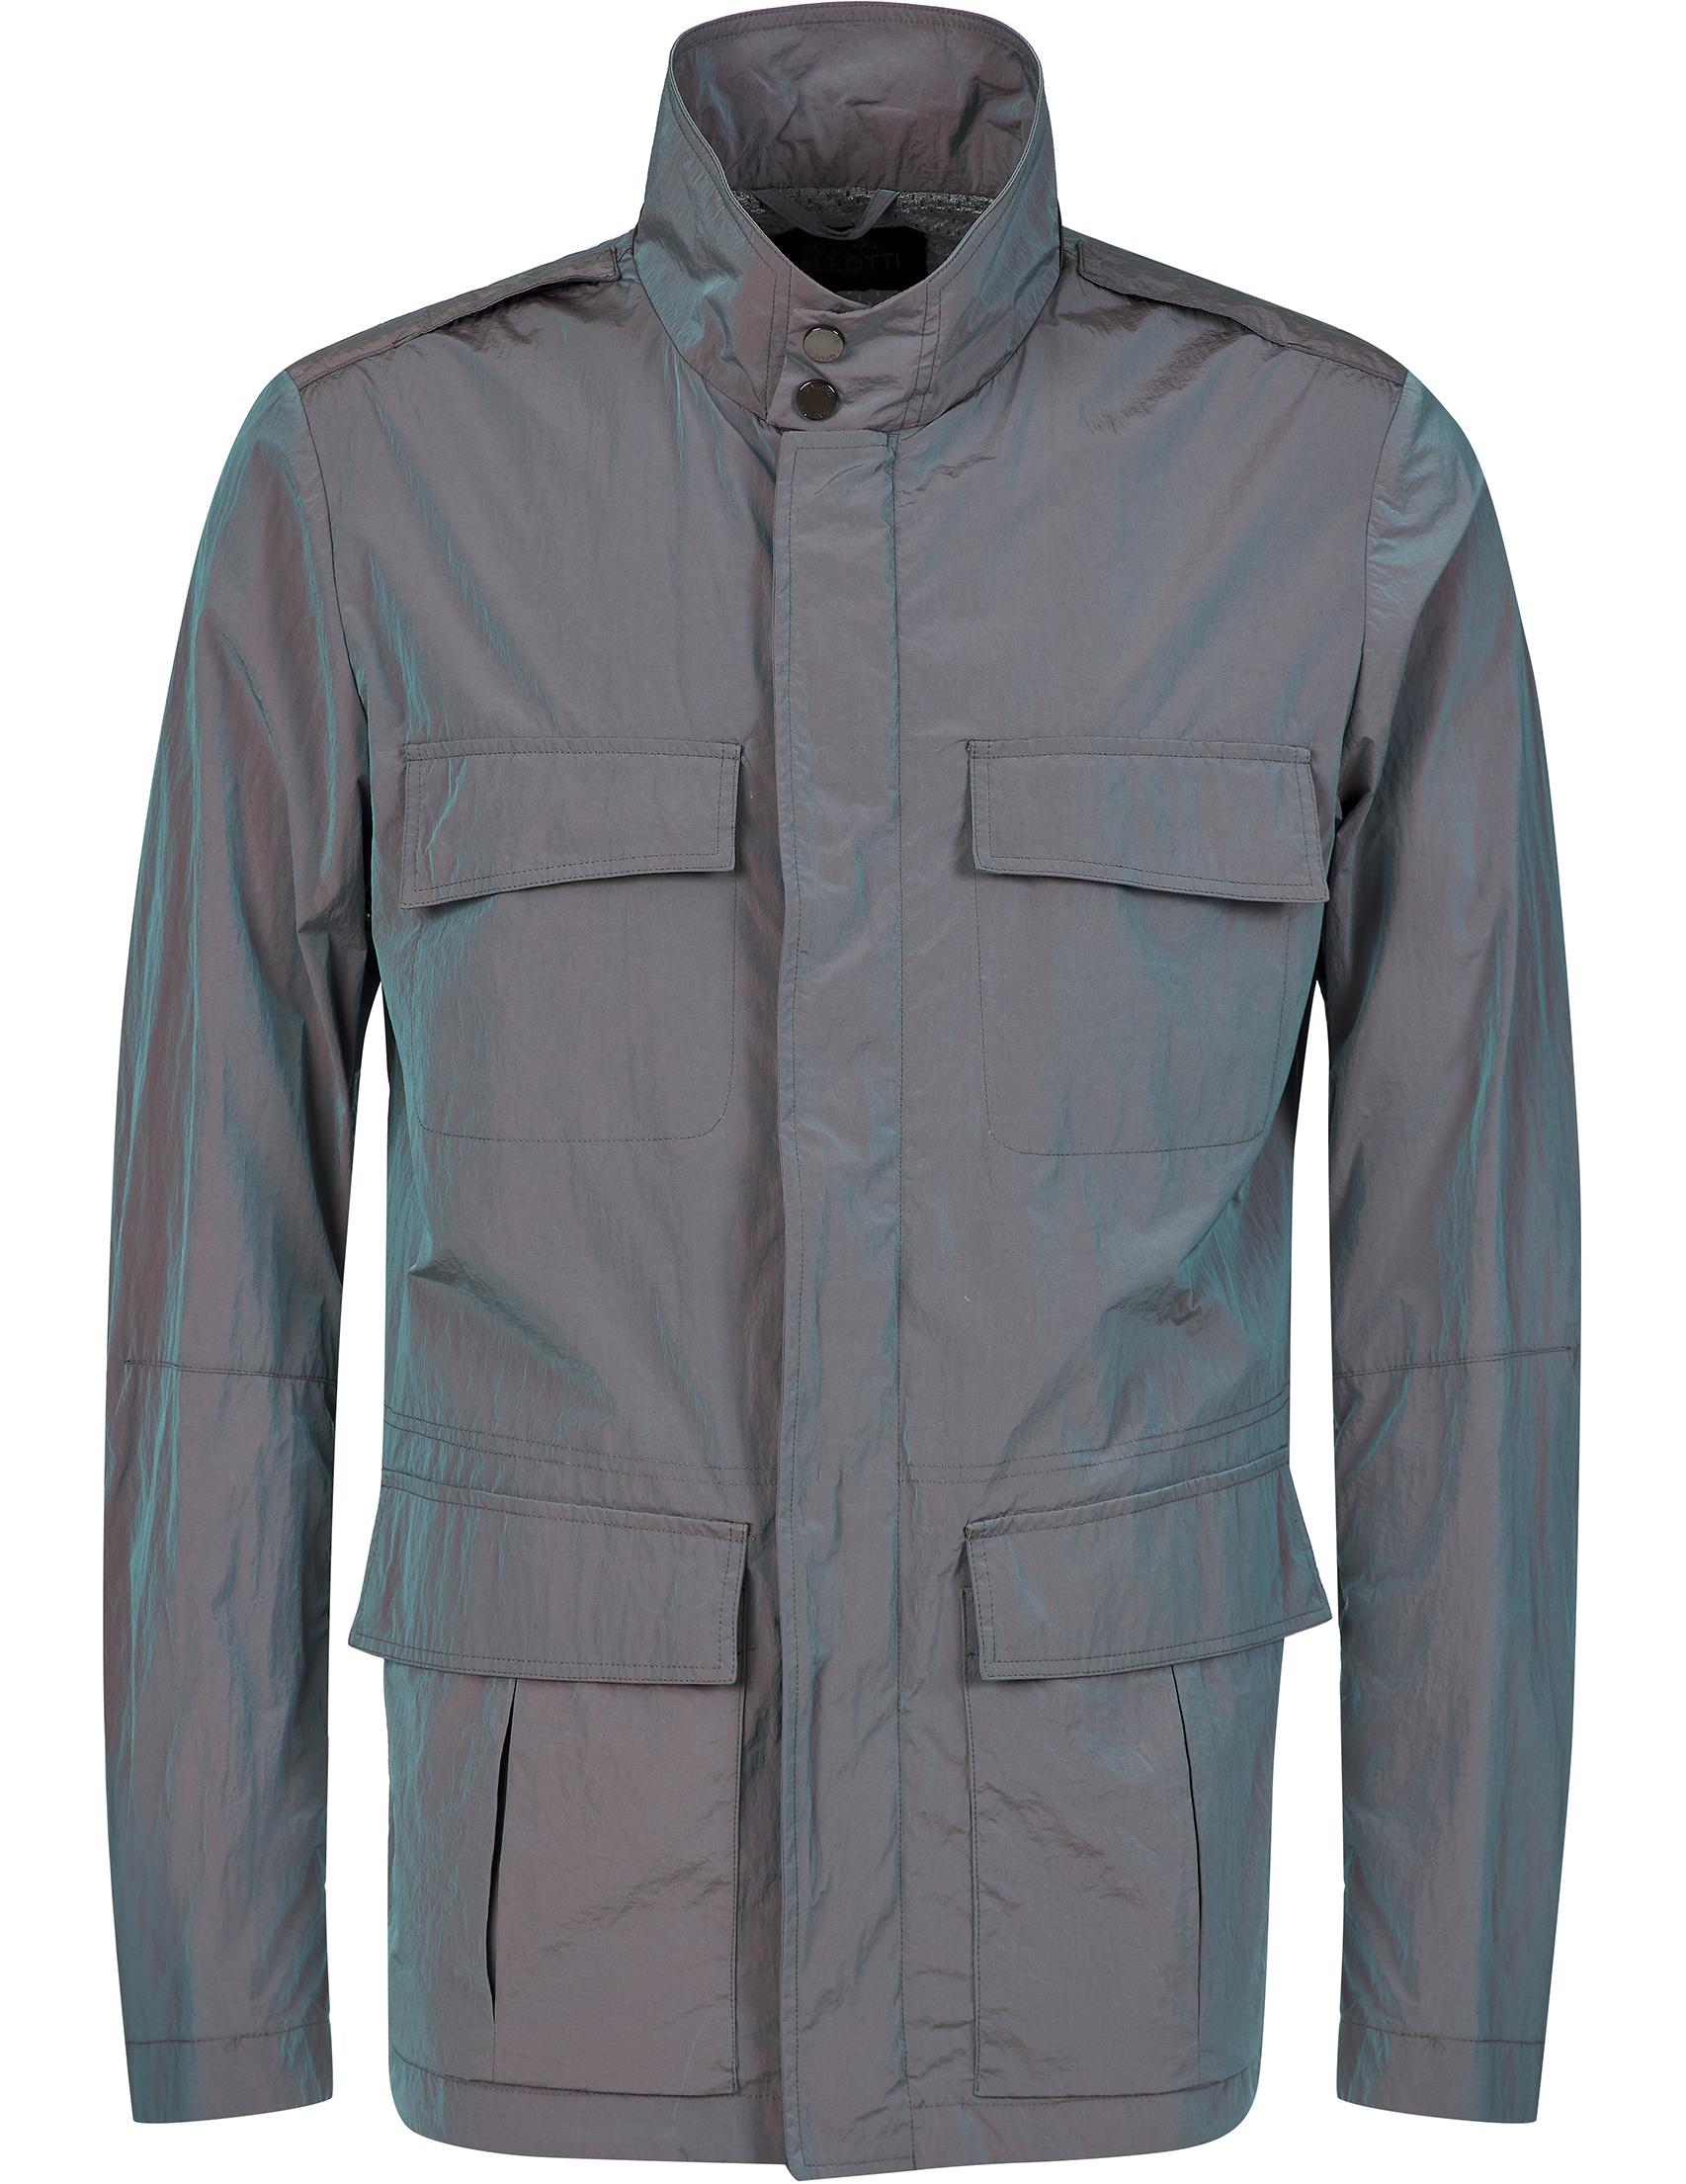 Купить Куртки, Куртка, GALLOTTI, Серый, 100%Полиэстер;100%Полиамид, Осень-Зима